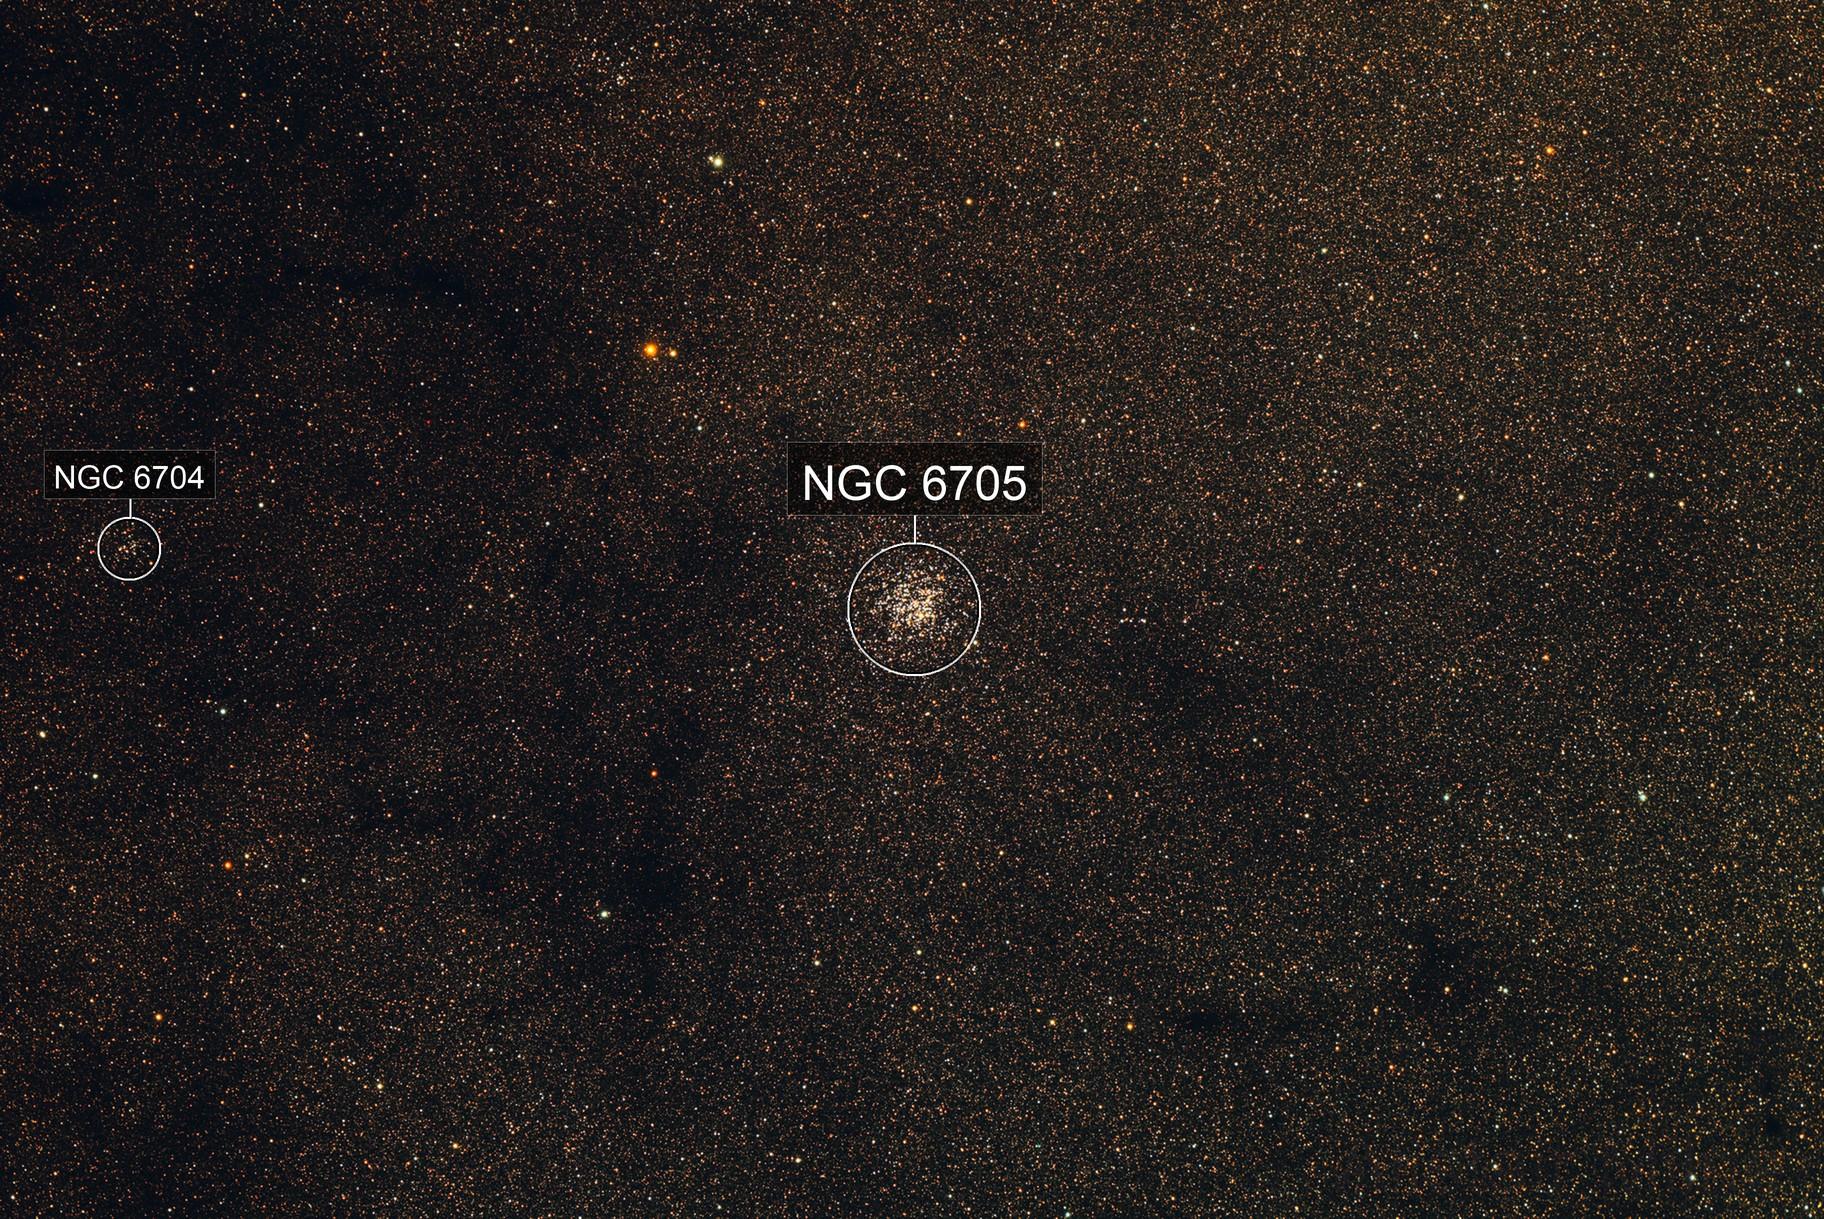 Messier 11 - The Wild Ducks Cluster